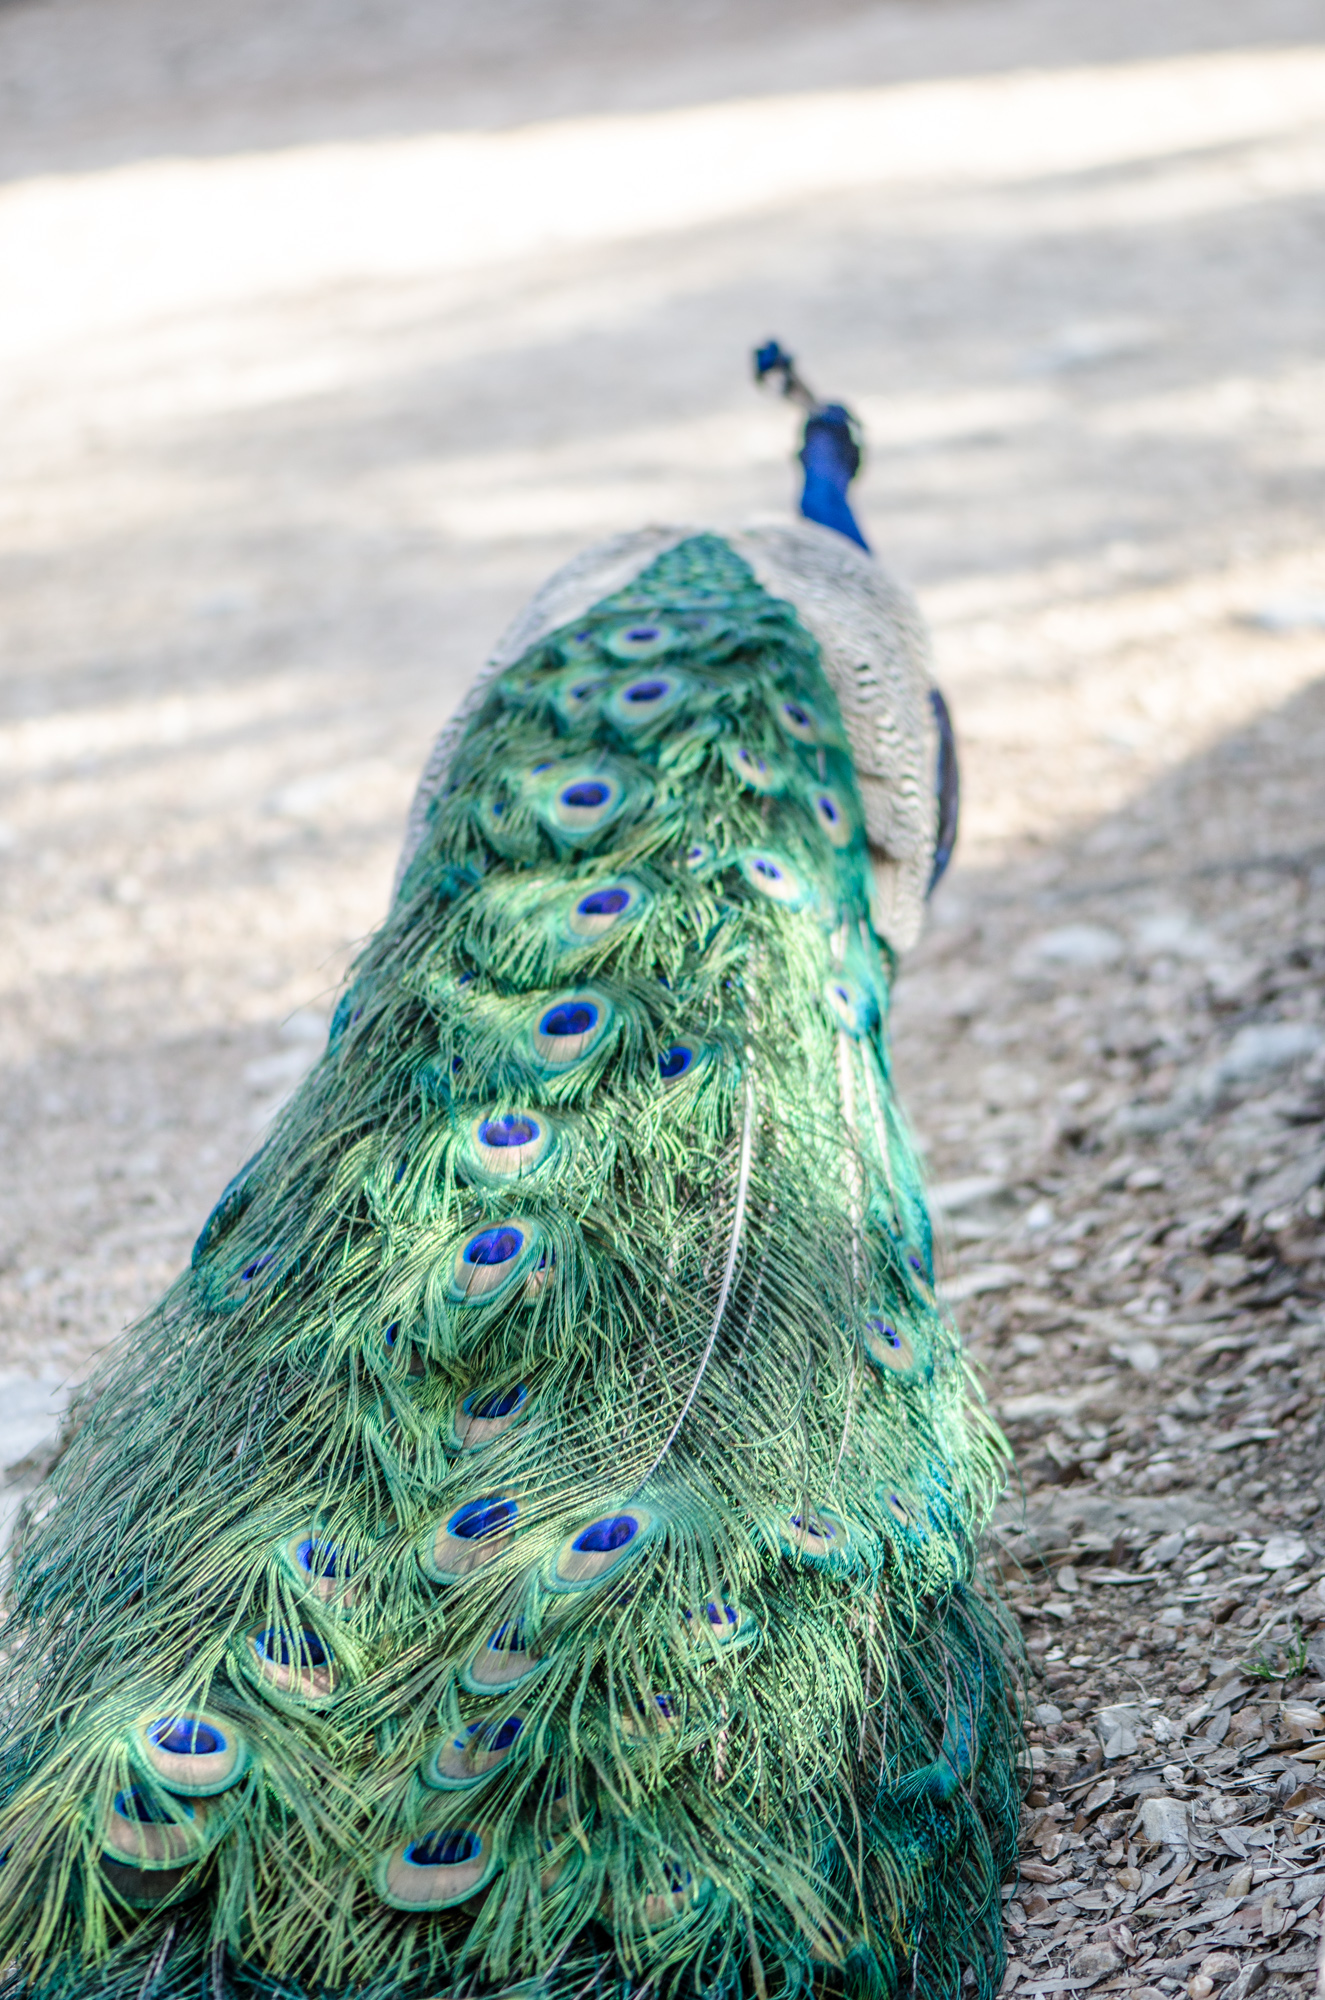 Austin Zoo (12 of 12)